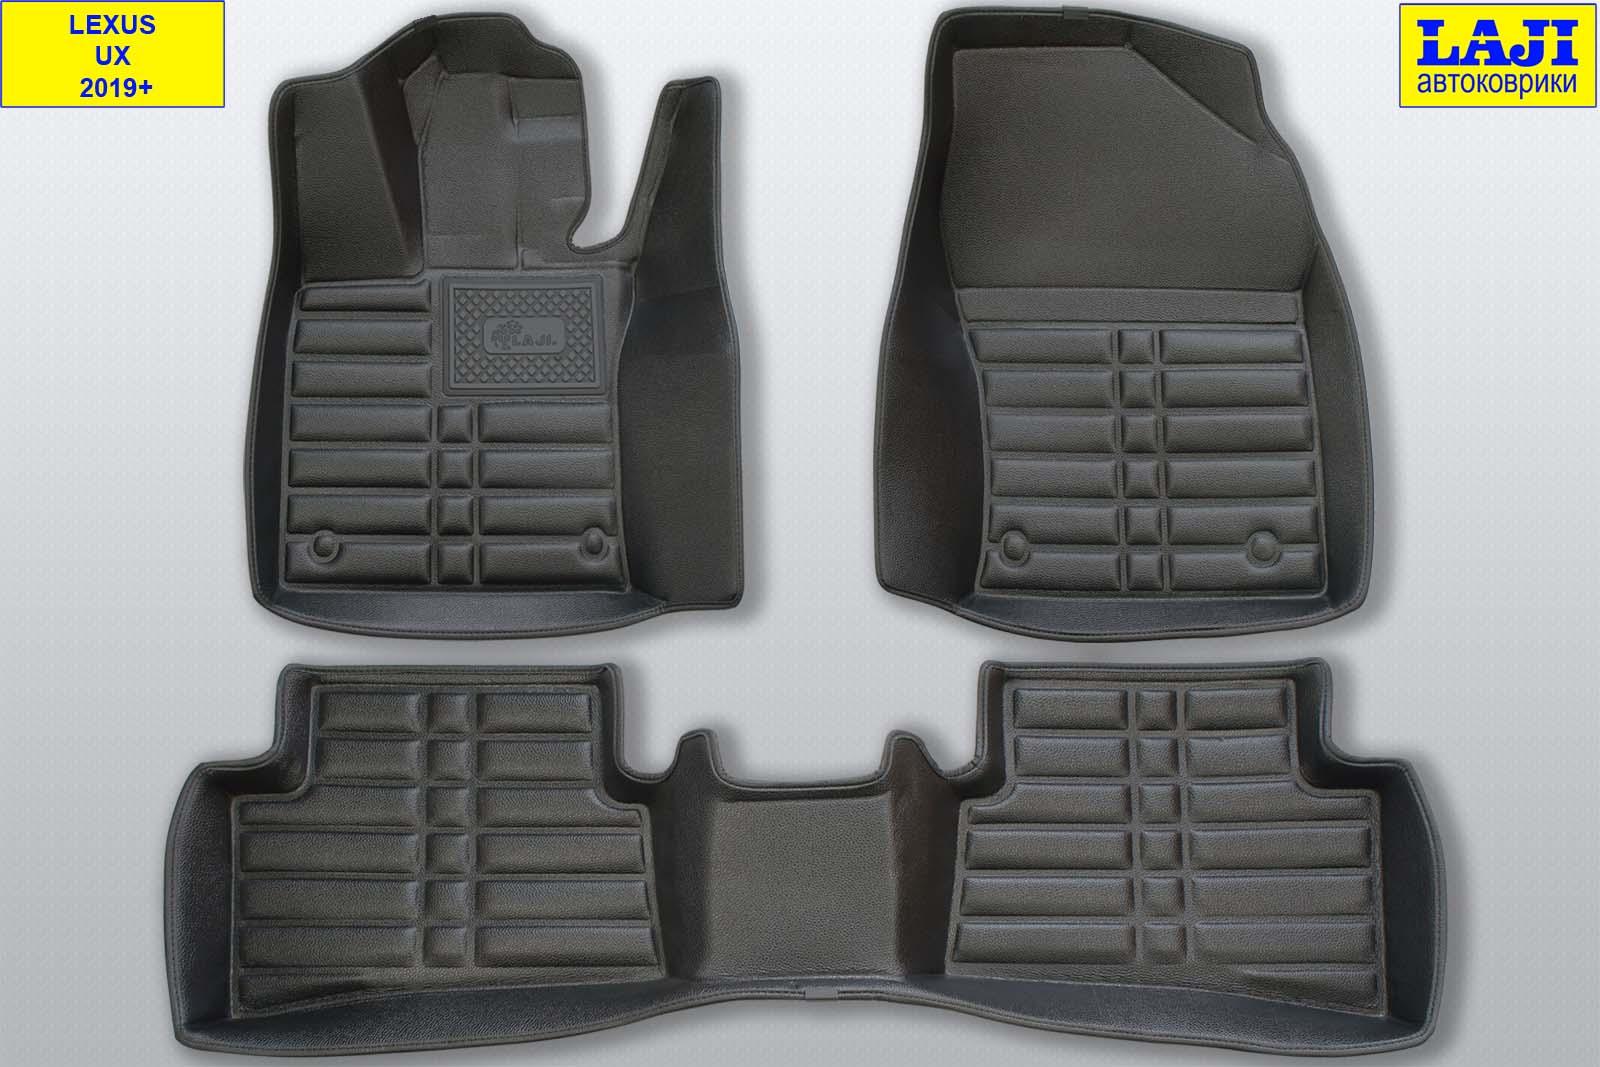 5D коврики в салон Lexus UX 2019-н.в. 1